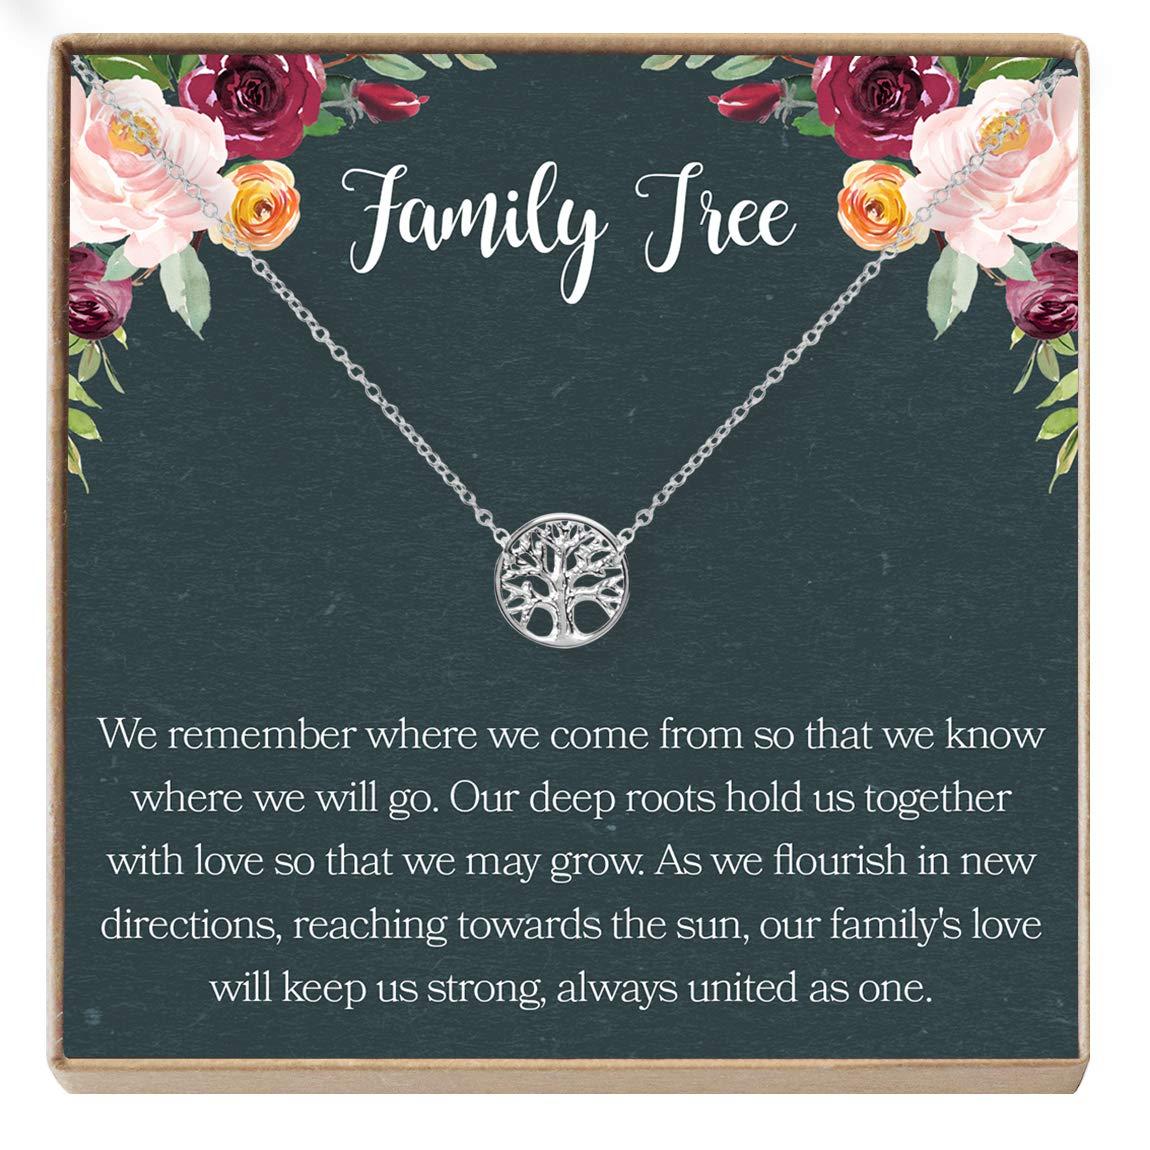 Tree Generations Dear Ava Family Tree Necklace Gift: Tree of Life Necklace Pendant Charm